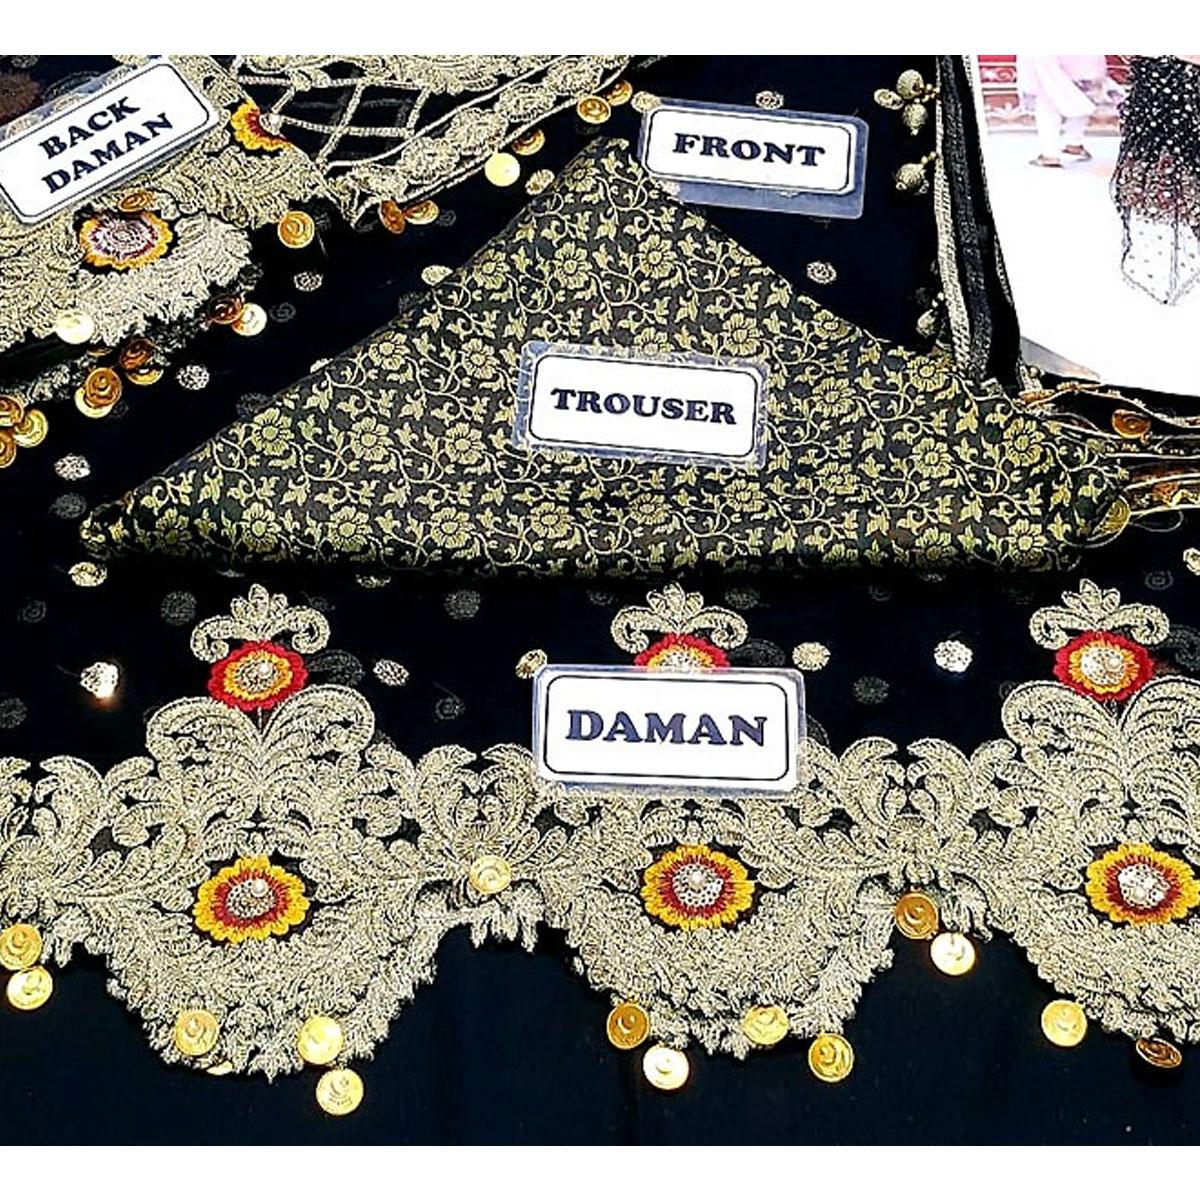 Heavy Embroidered Black Chiffon Wedding Dress - (CHI-328) Gallery Image 2